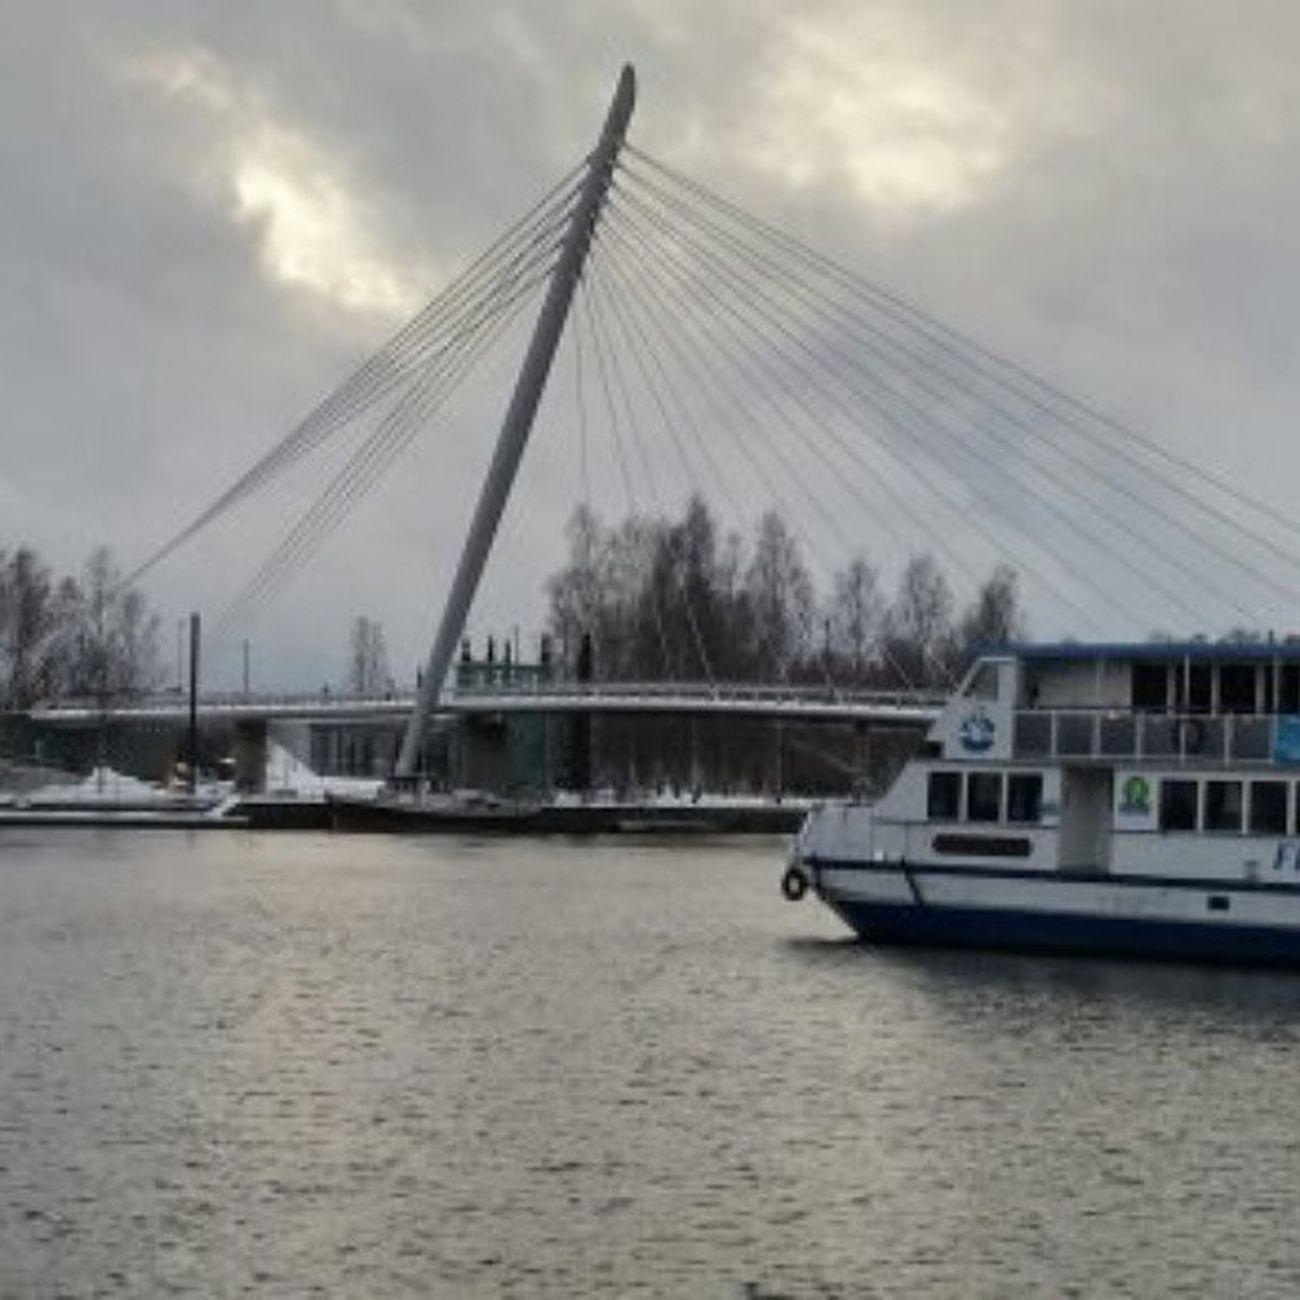 Tampere Laukontori Finnishsilverline Bridge Silta Suomi Finland Ilovetampere Ilovefinland Visittampere Tre Tampereallbright